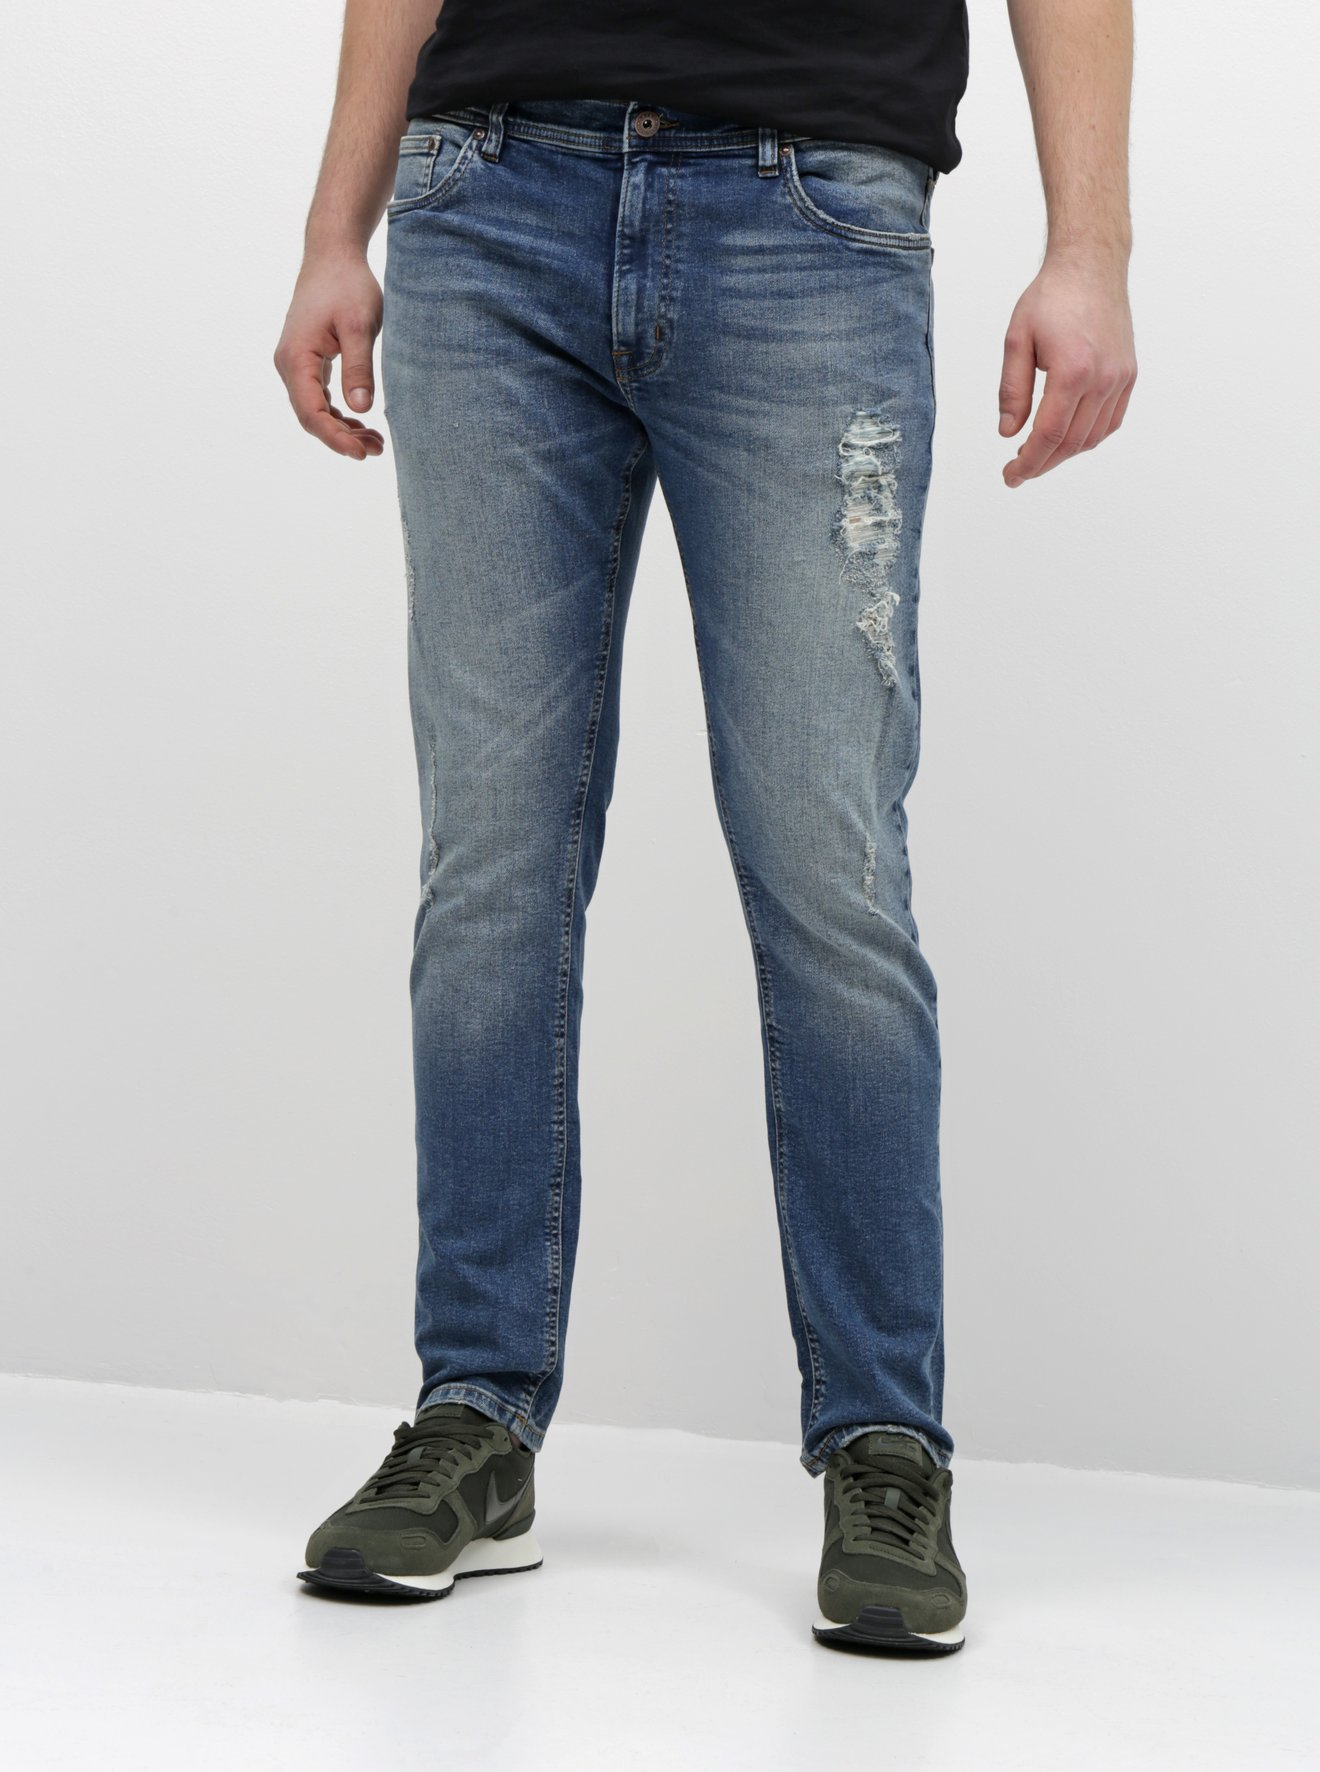 Modré slim fit džíny s potrhaným efektem Shine Original